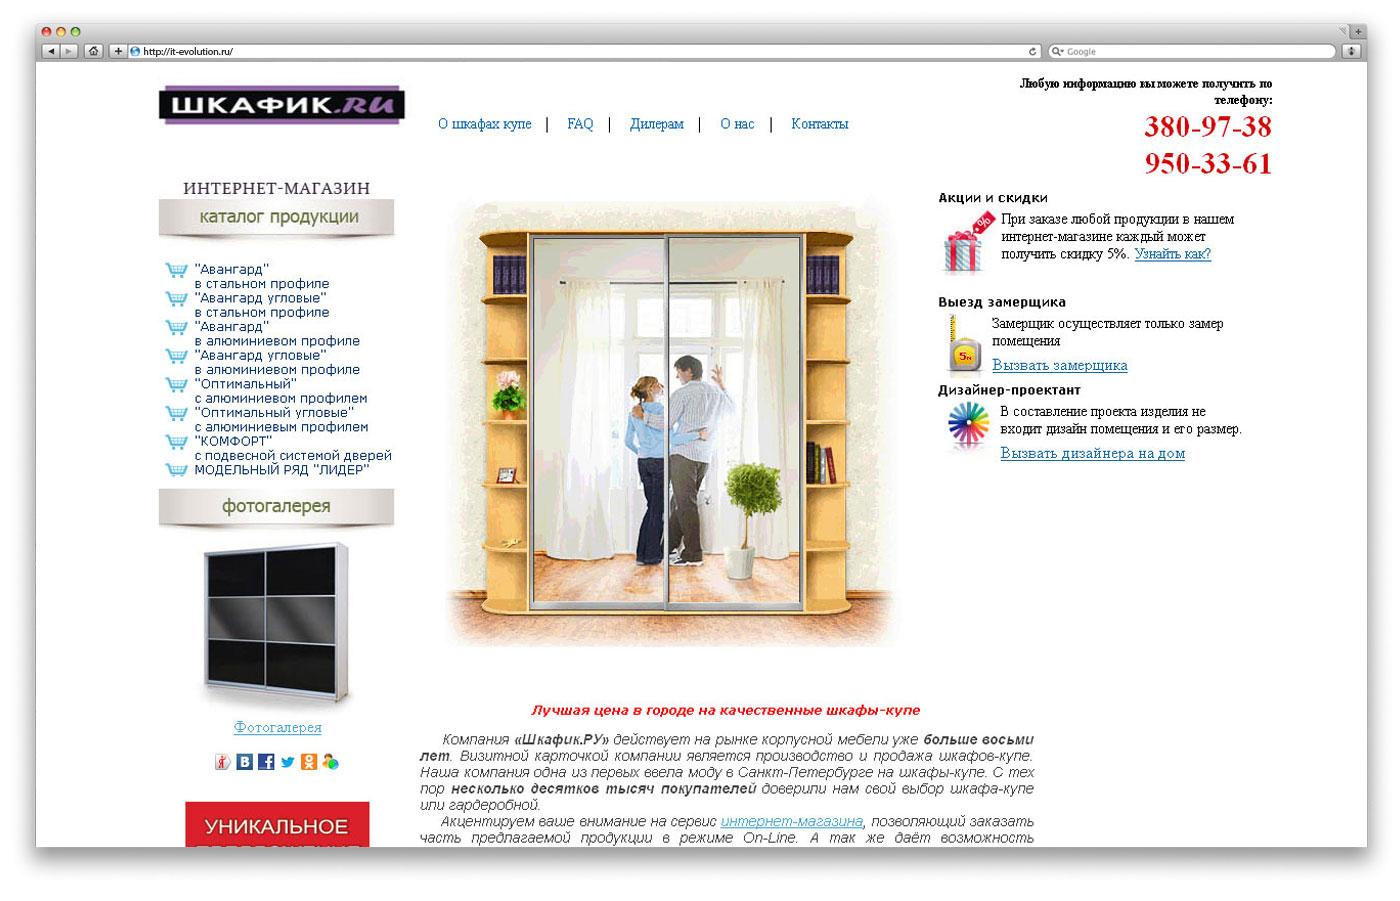 Шкафик.РУ шкафы-купе в Санкт-Петербурге